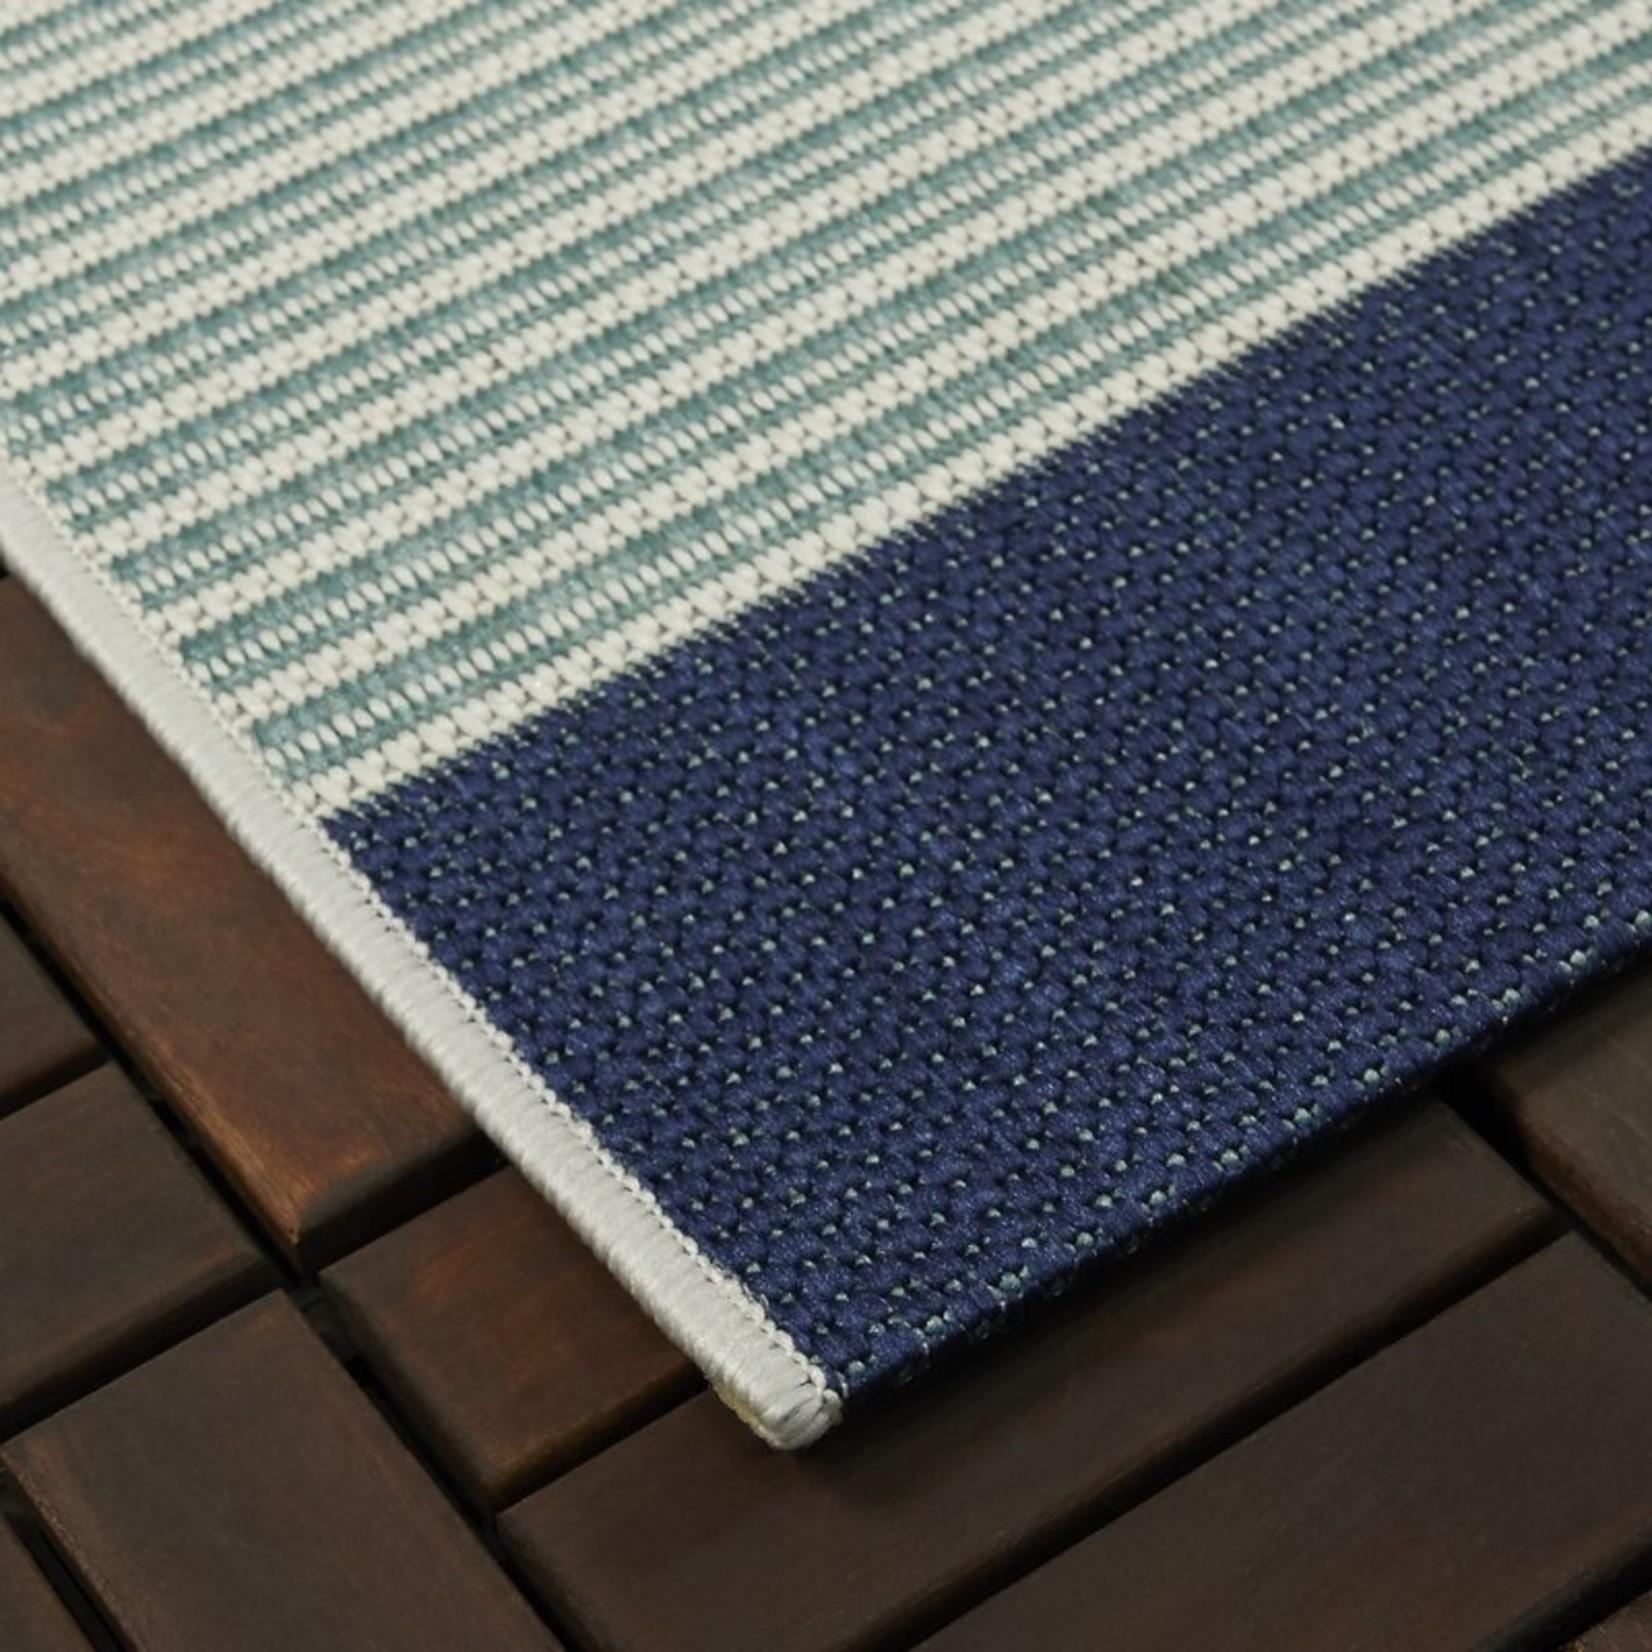 "*5' x 7'2"" - Mckelvey Flatweave Navy Blue/Ivory Indoor/Outdoor Use Rug - Dirt on Edge"